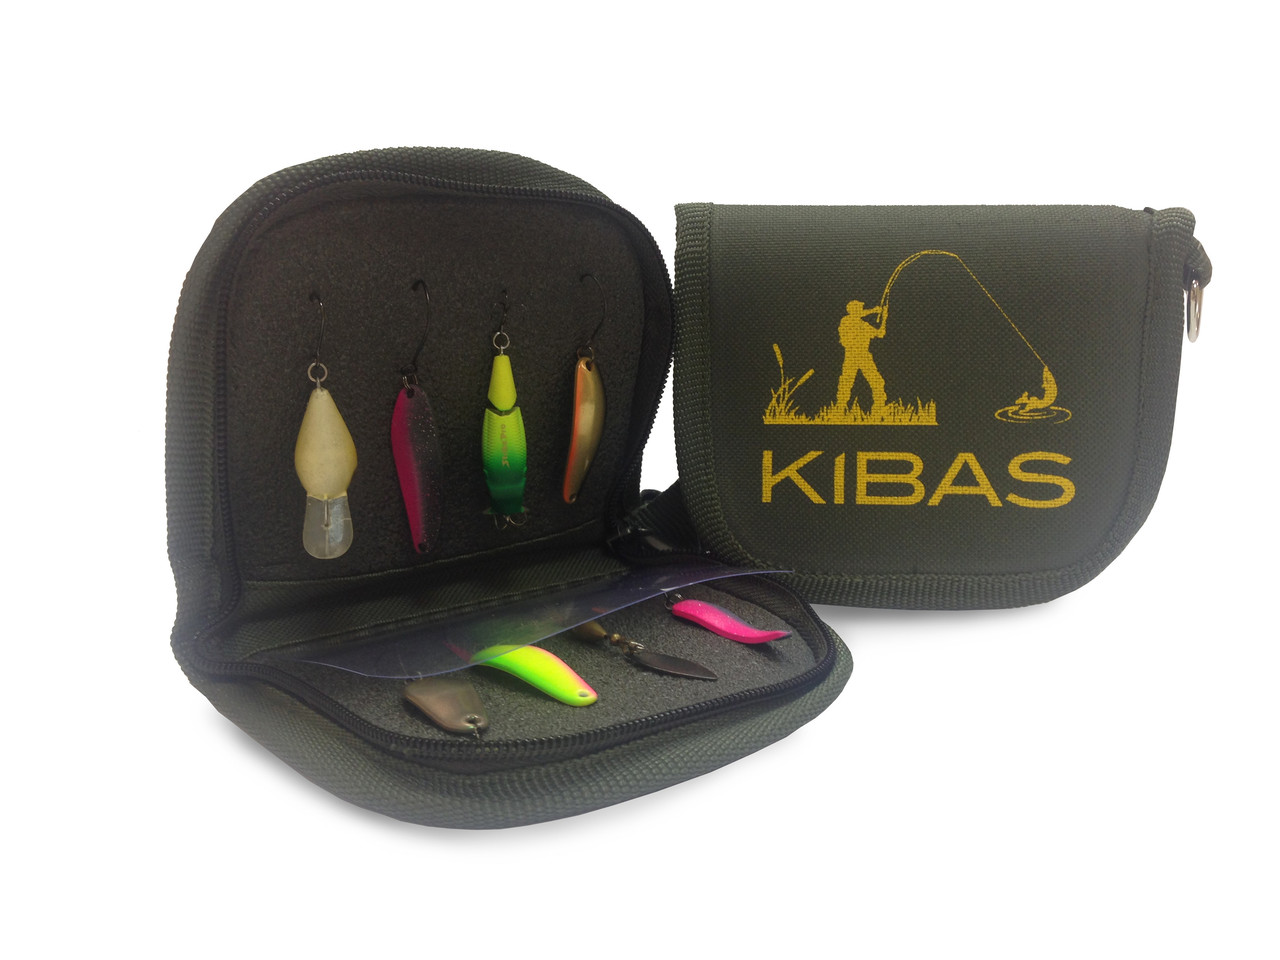 Кошелек сумка чехол для блесен приманок мормышек крючков Kibas (Кибас) 110х100х20 мм Хаки